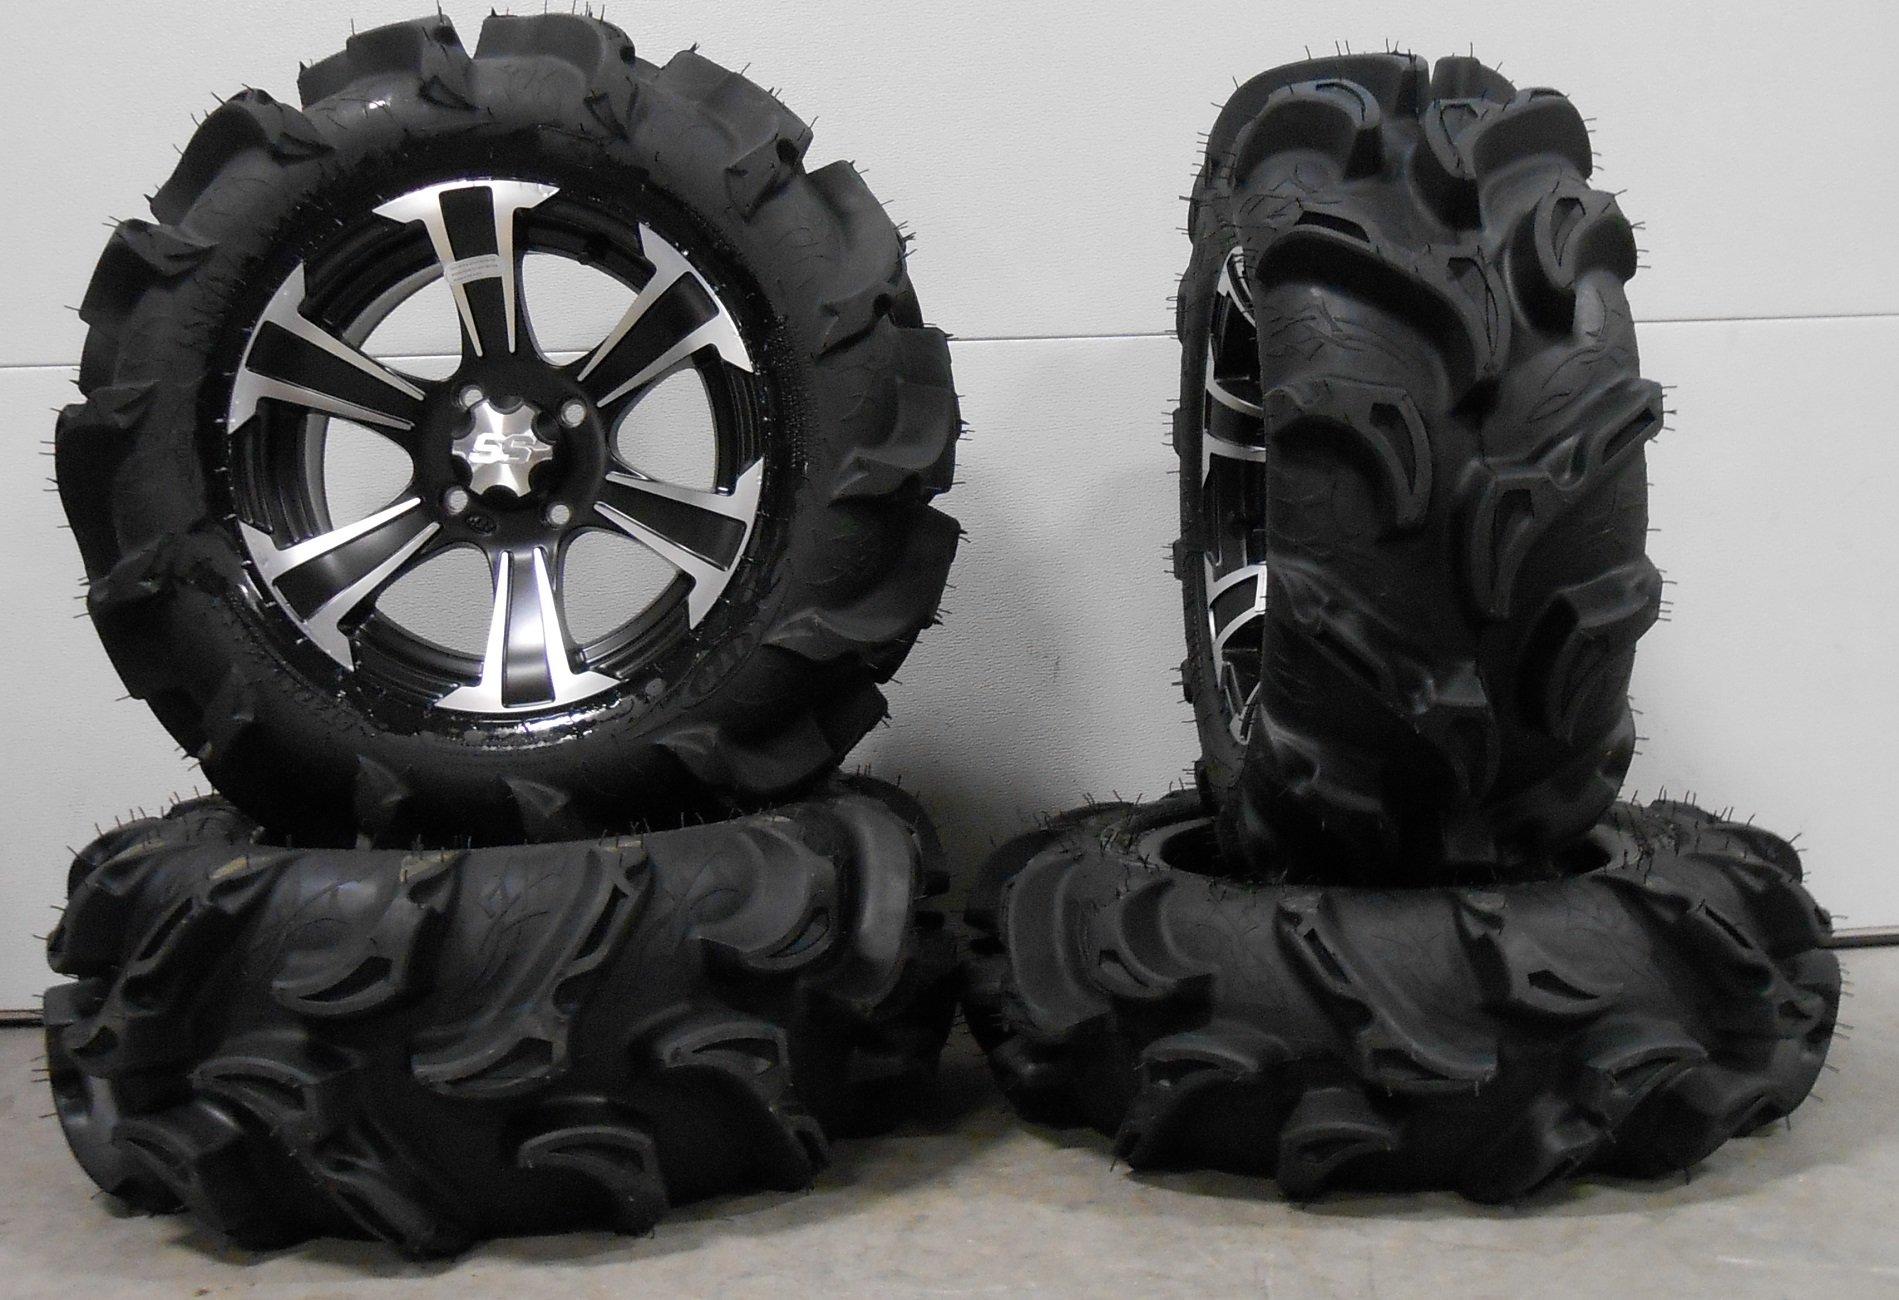 Bundle - 9 Items: ITP SS312 14'' Wheels Black 27'' Mega Mayhem Tires [4x156 Bolt Pattern 3/8x24 Lug Kit]